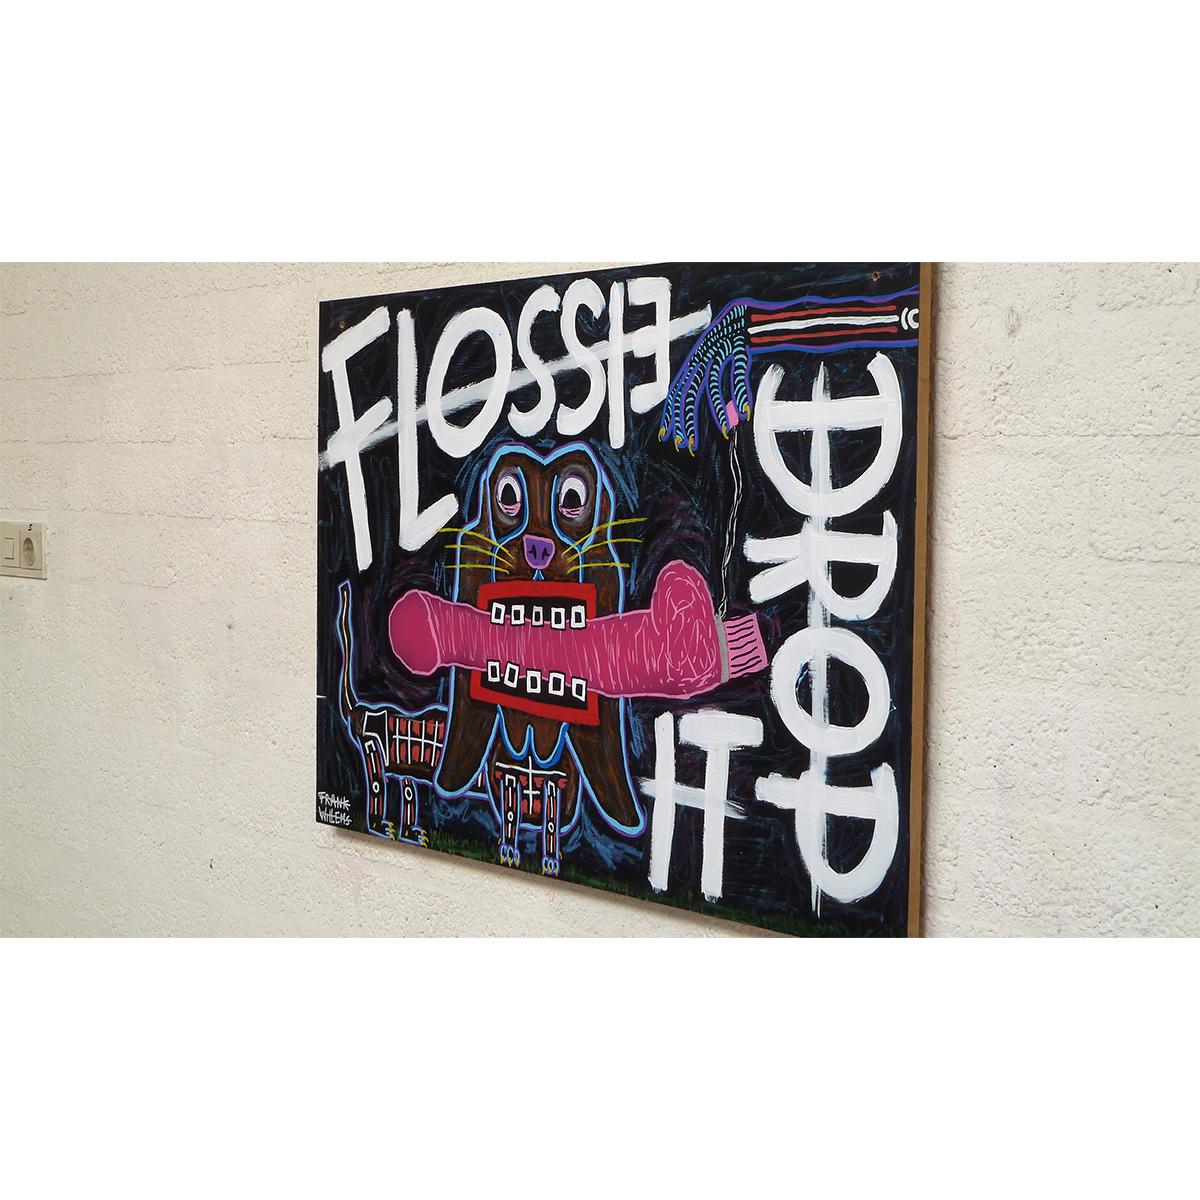 FLOSSIE, DROP IT! 03 - Frank Willems